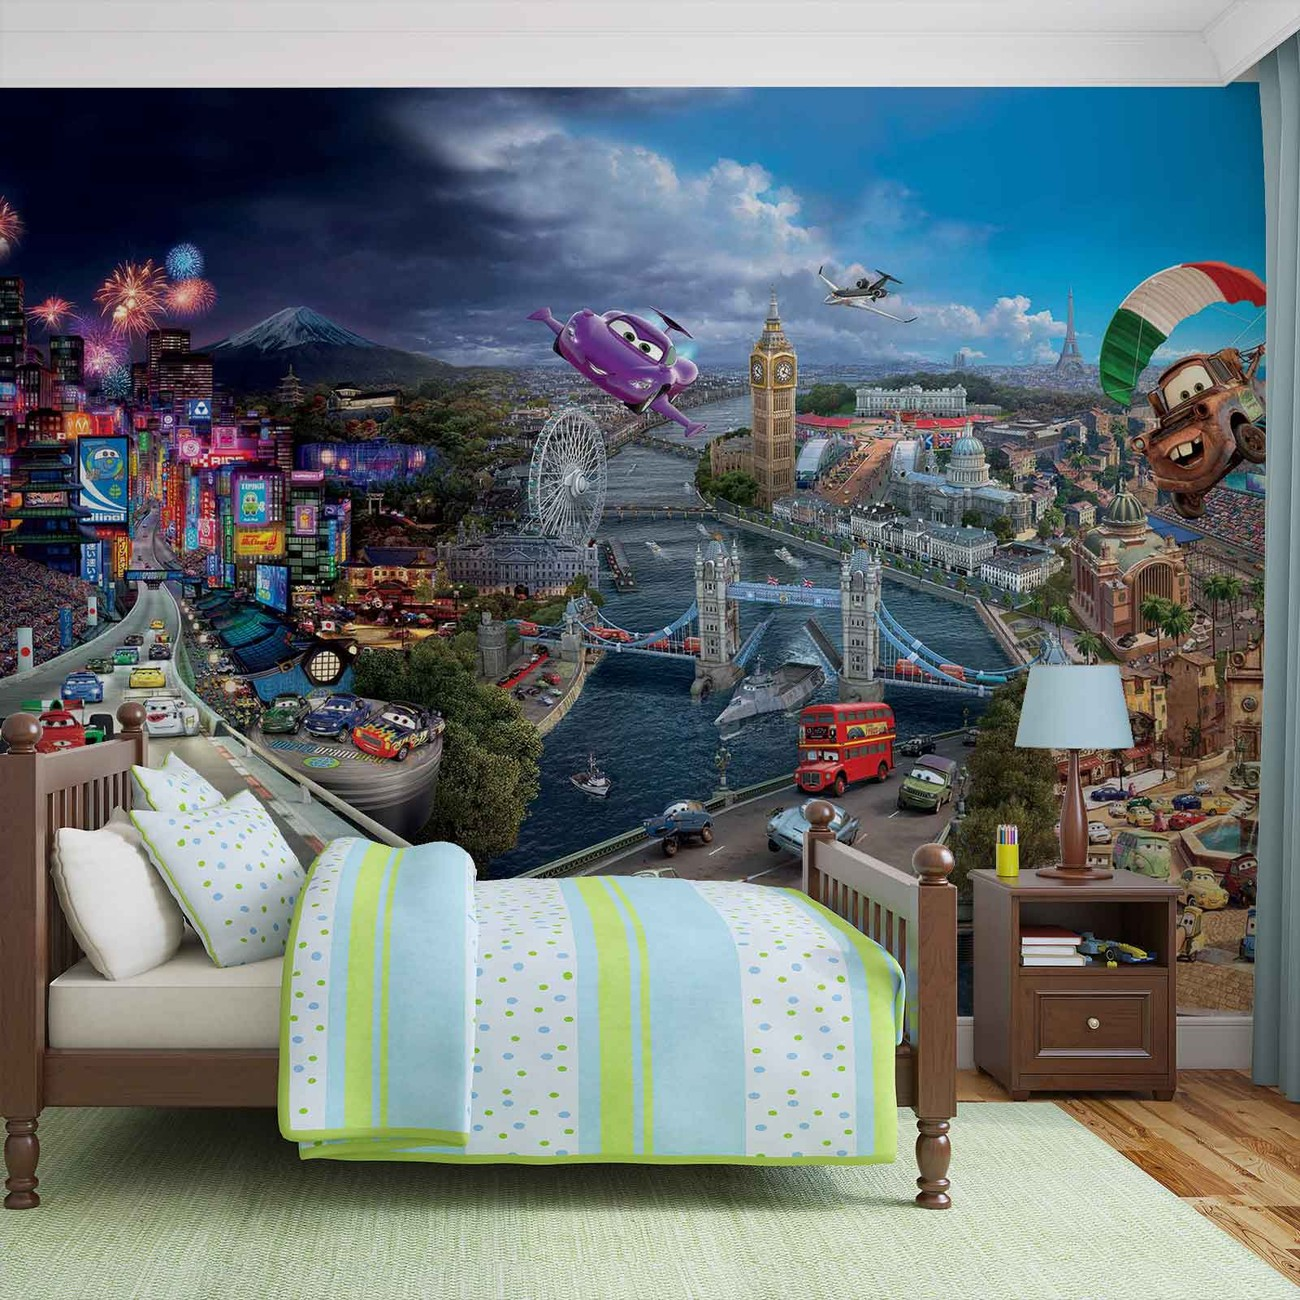 Disney cars lightning mcqueen bernoulli wall paper mural for Cars movie wall mural